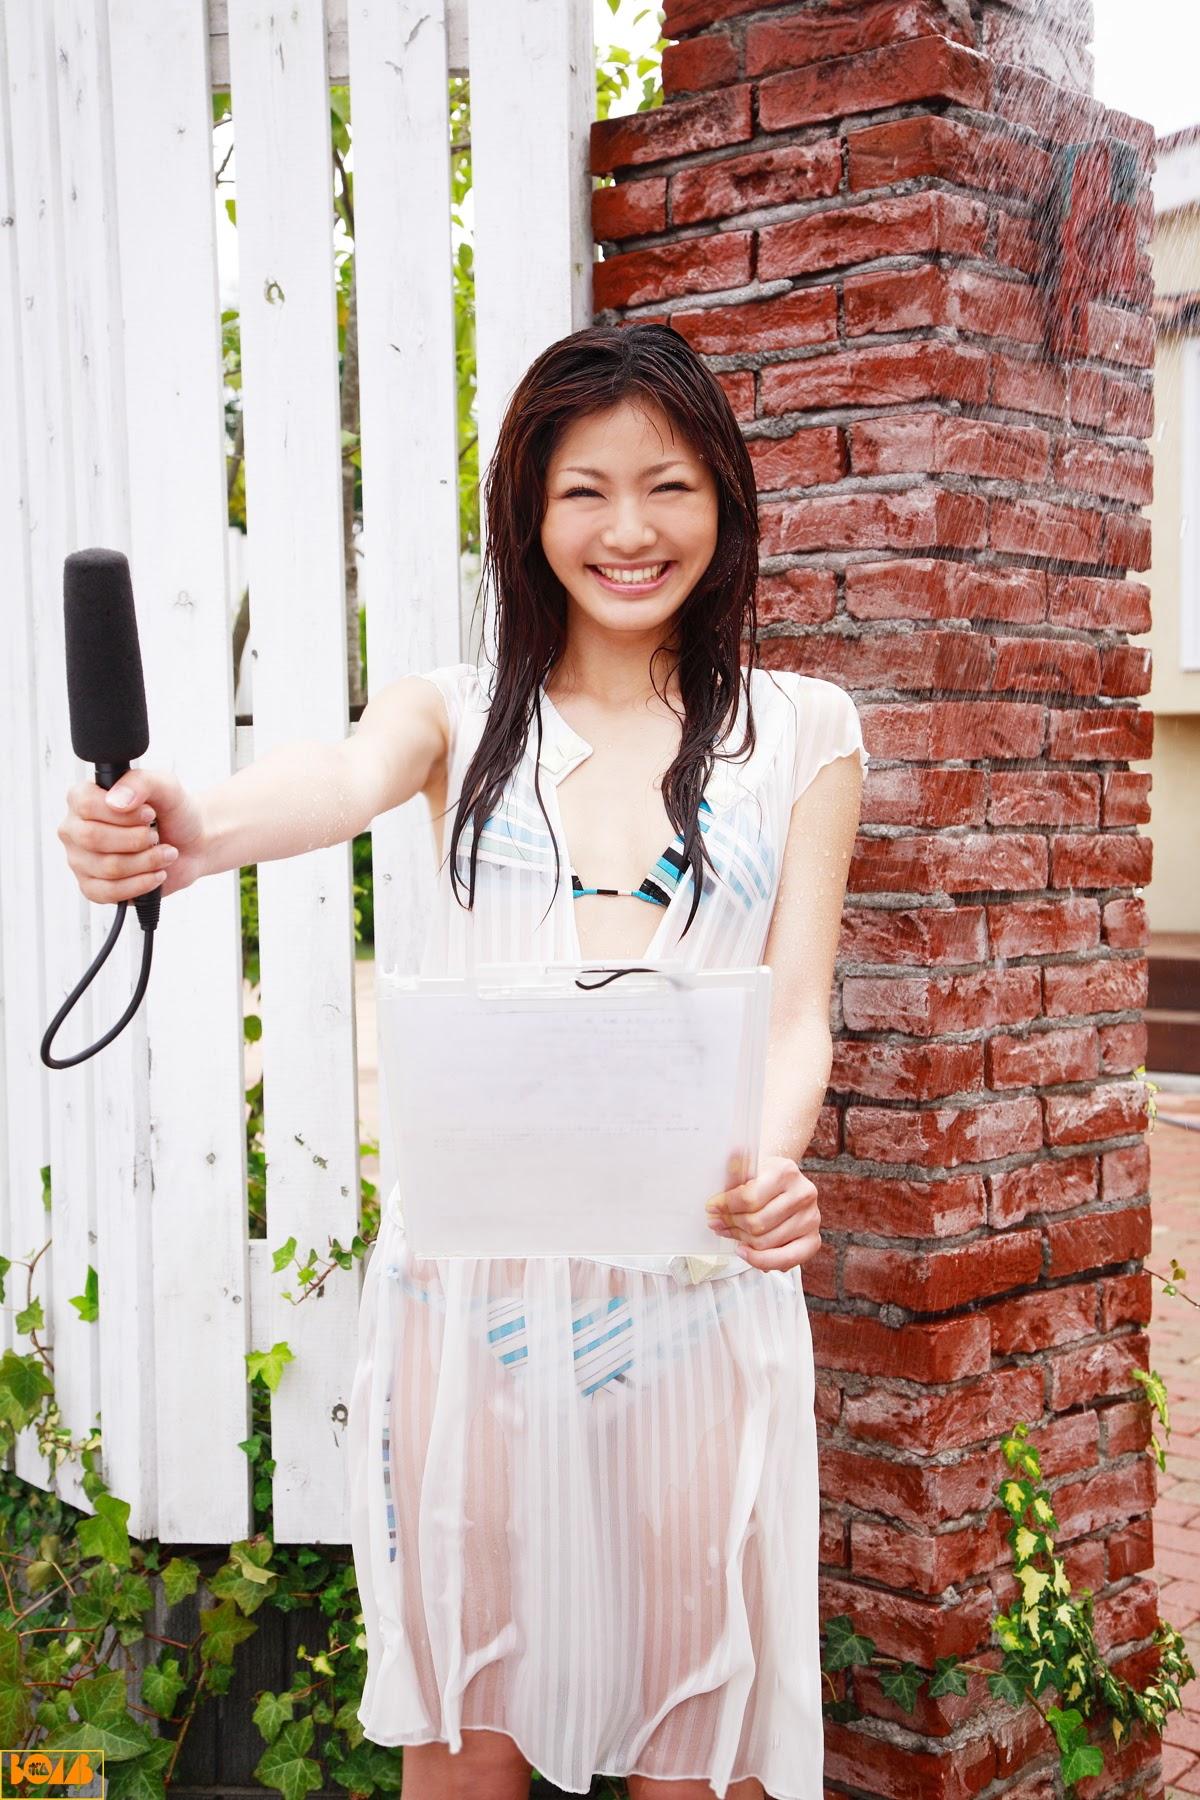 New era gravure harbor contact wet transparent sheer weather sister Rika Sato014